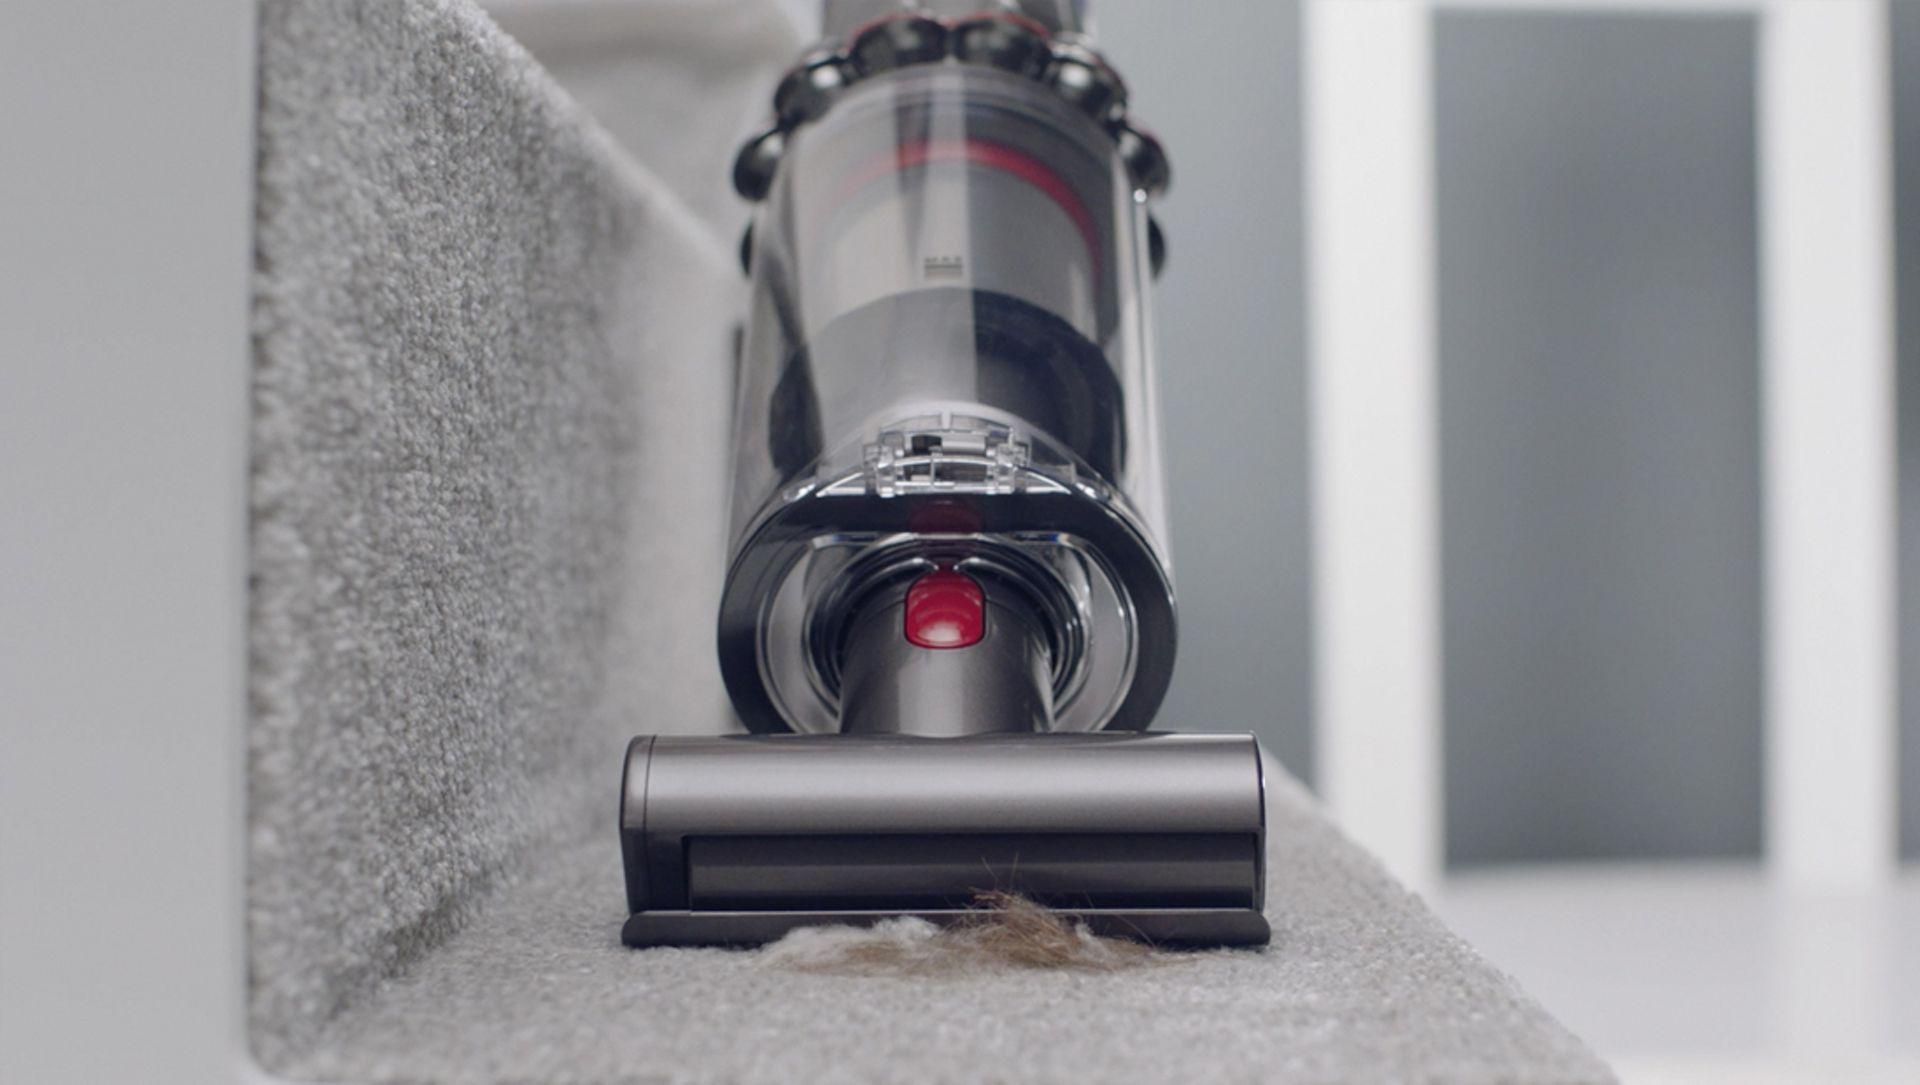 Mini motorised tool cleaning carpet on stairs